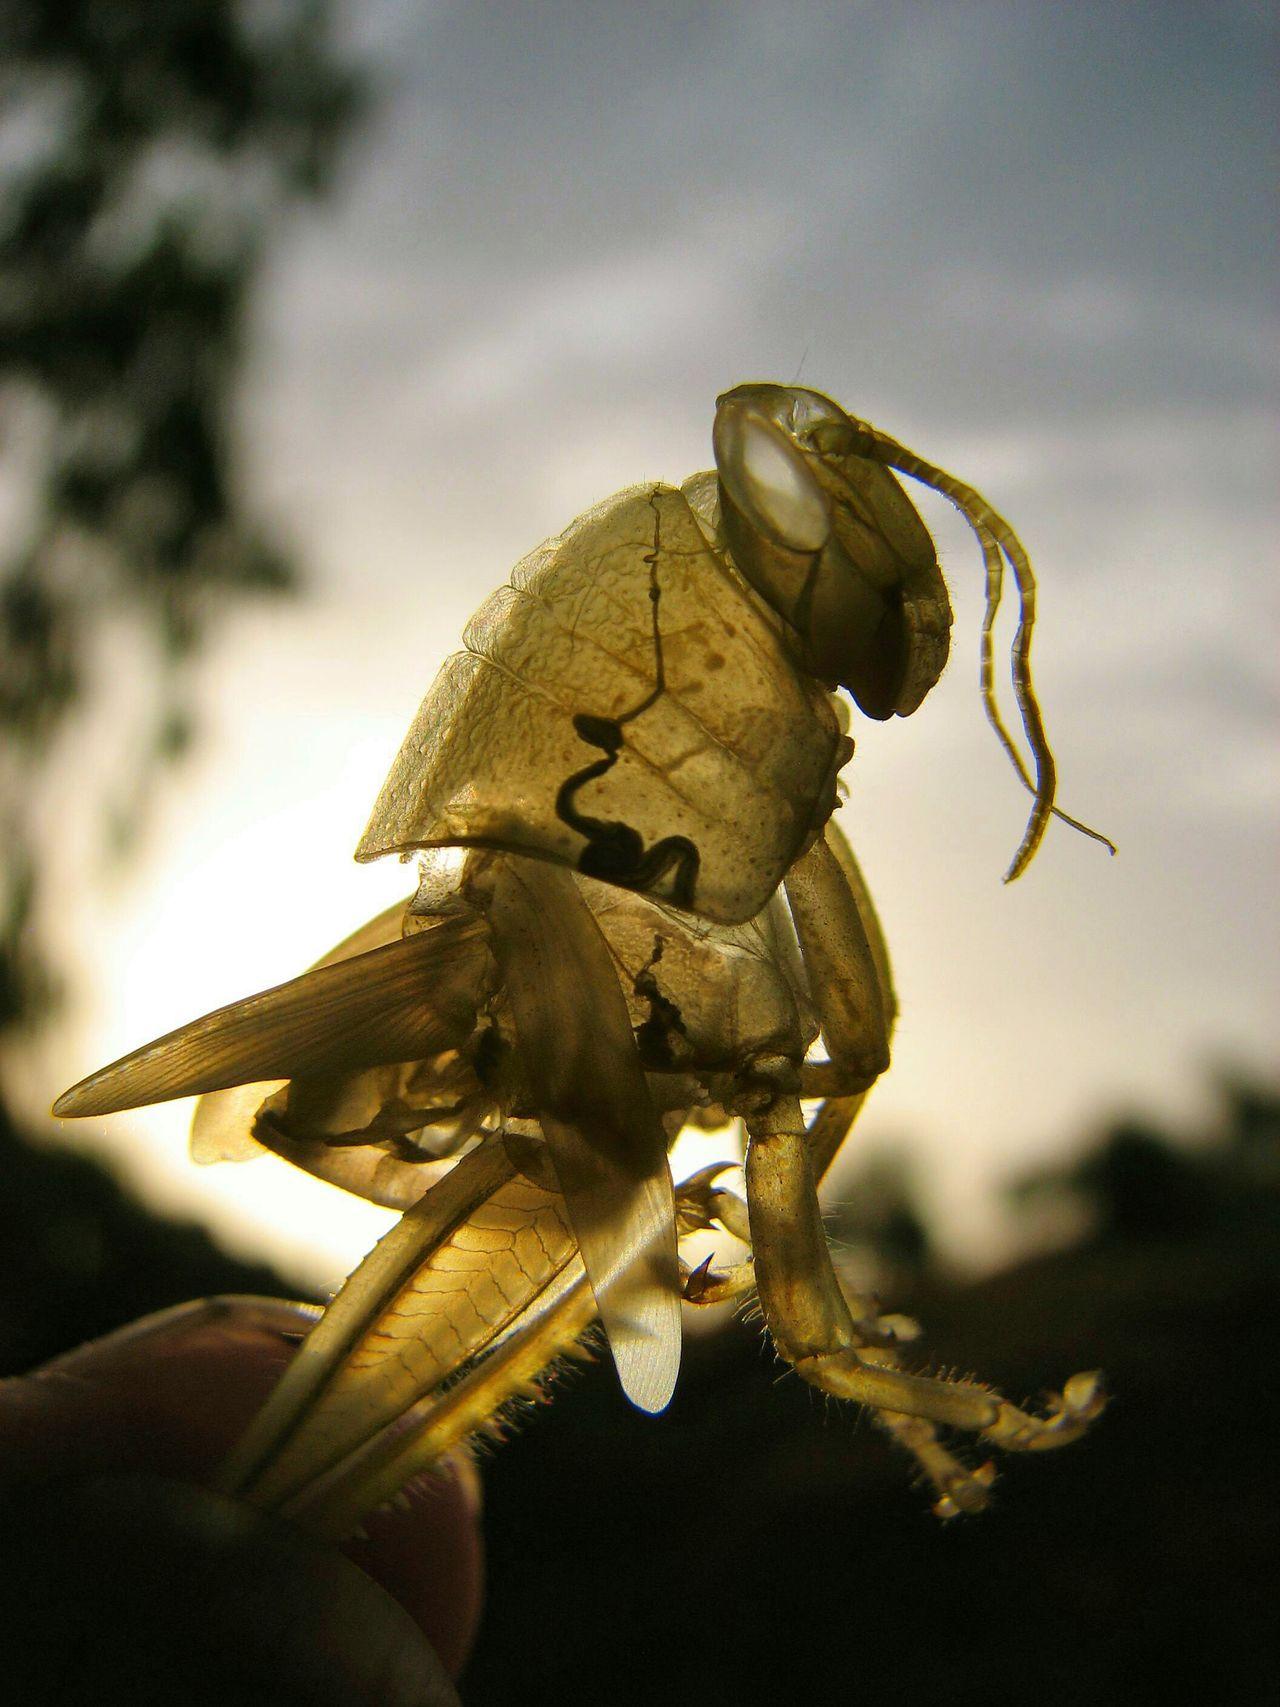 Grasshopper exoskeleton at sunset. Grasshopper Insects  Exoskeleton Andalucia Spain Maximum Closeness Andalucia Rural